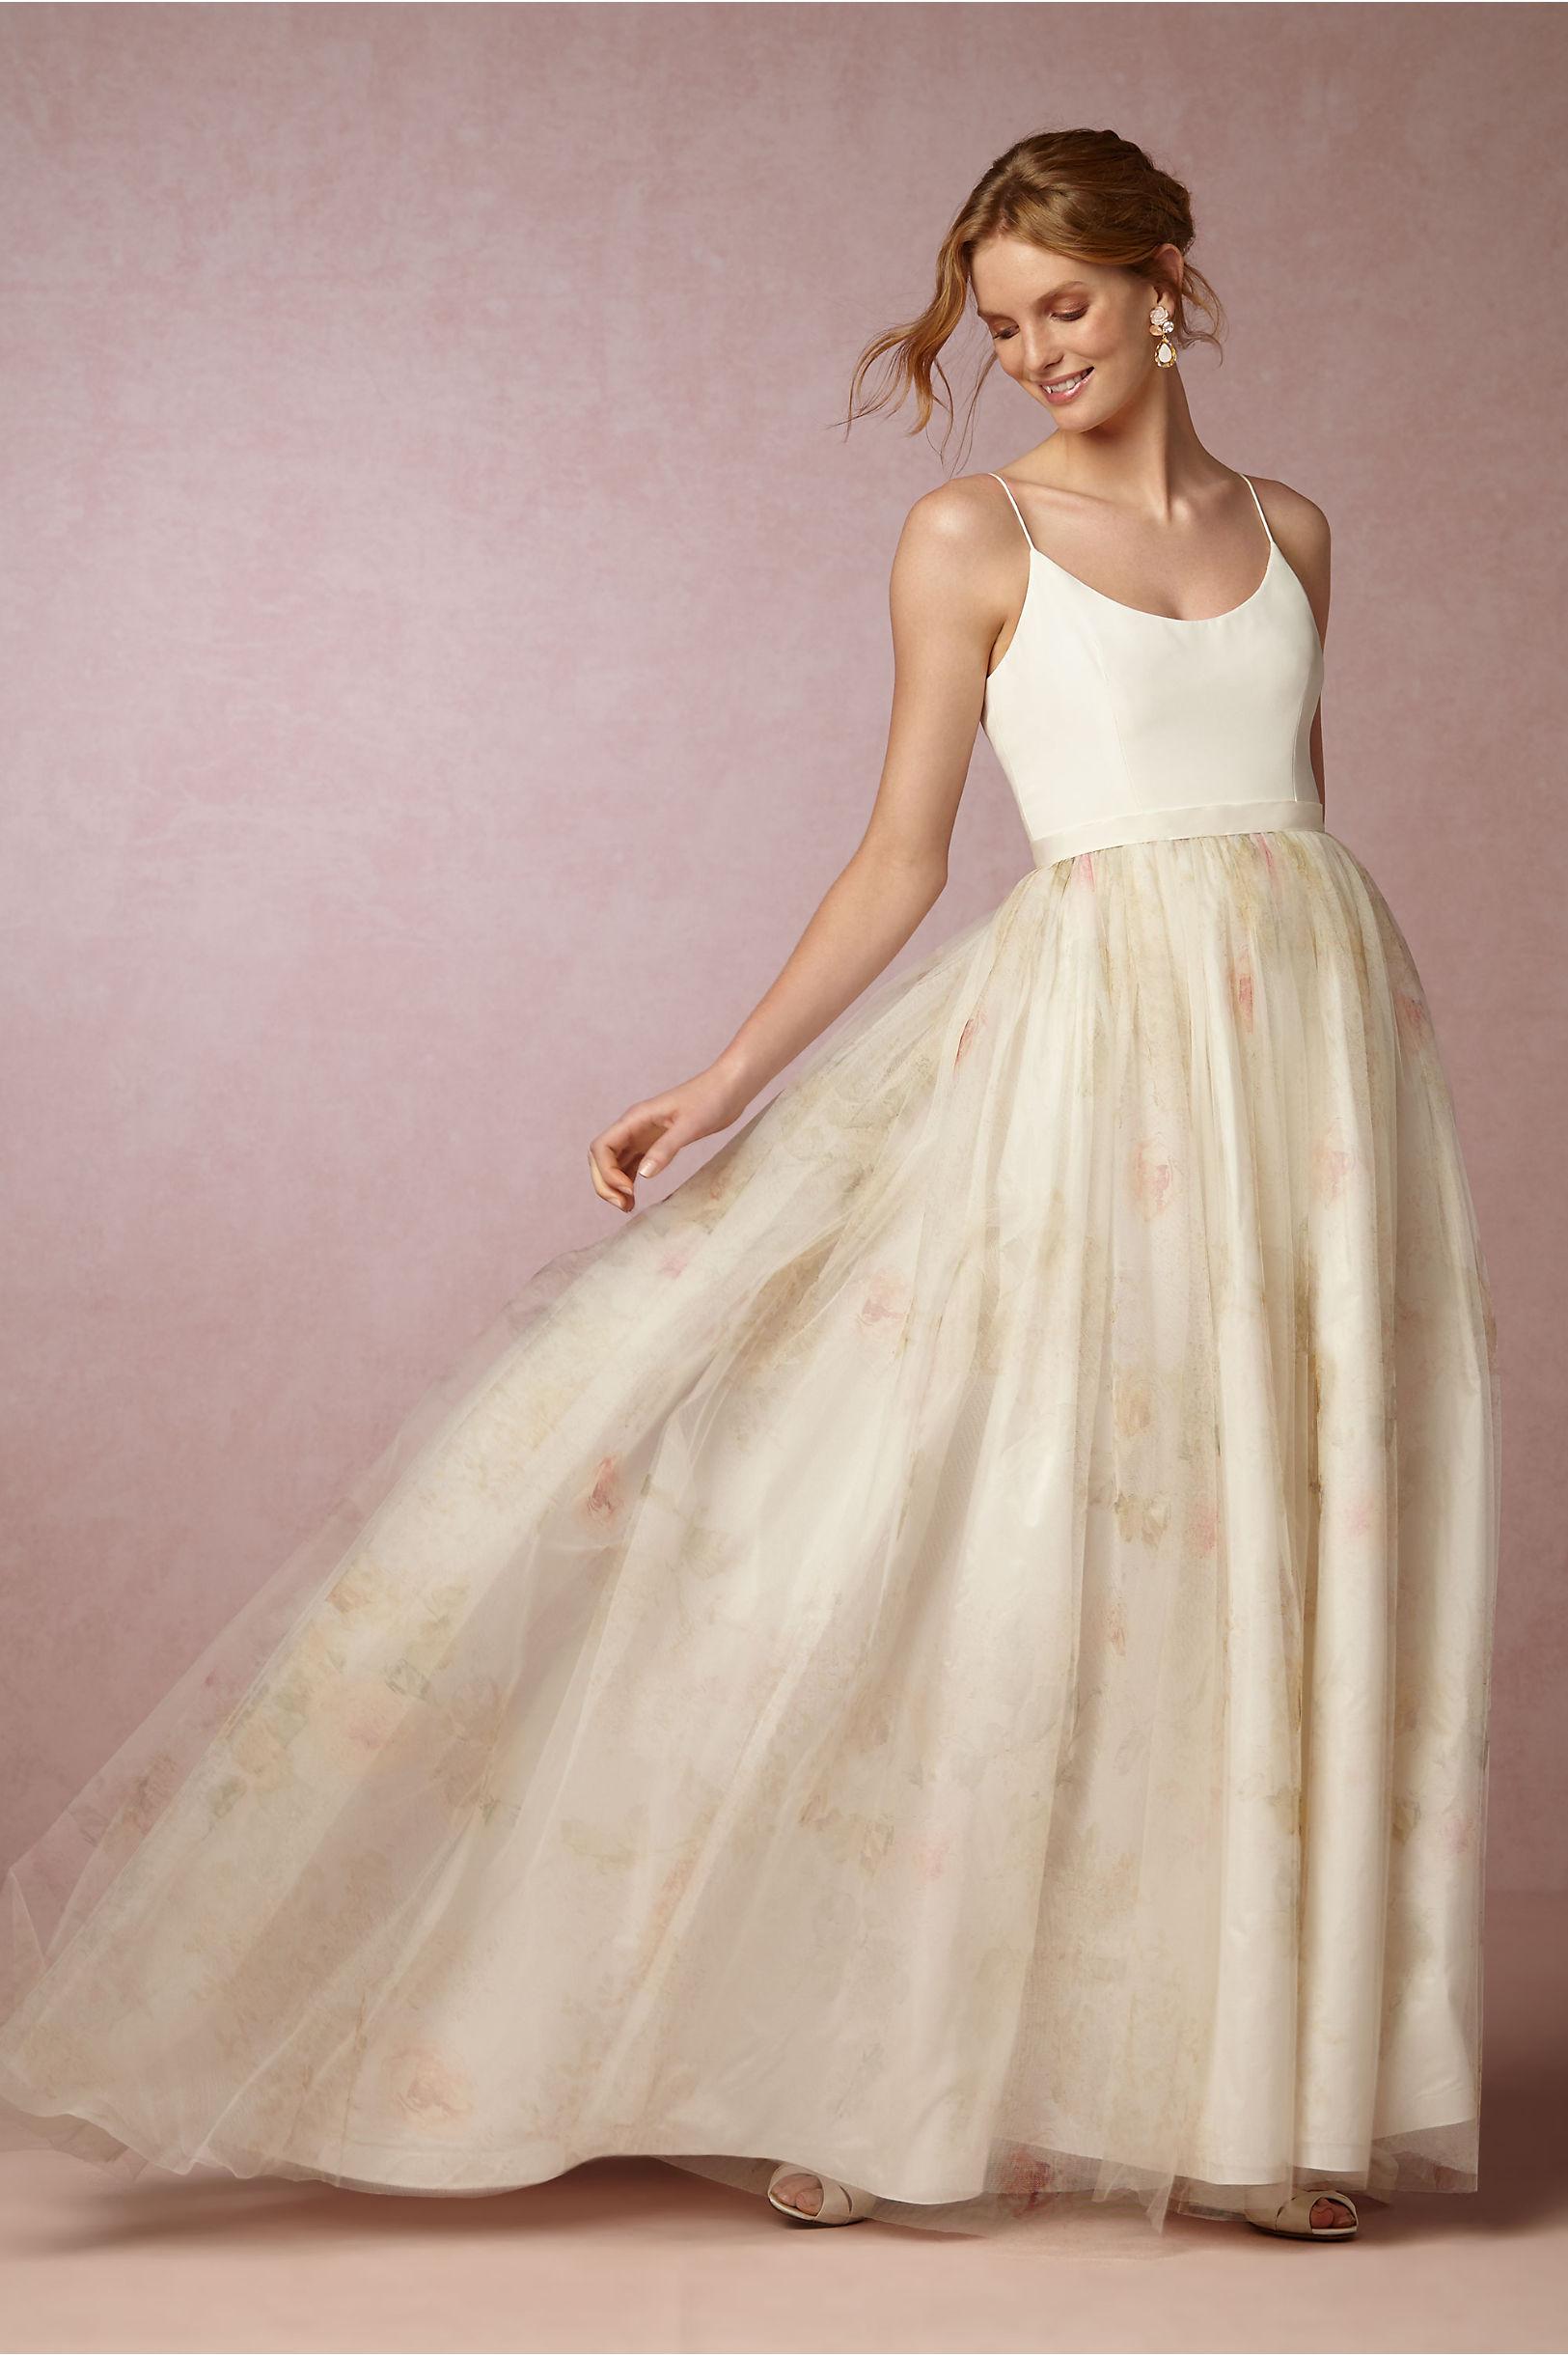 bhldn floral wedding dress for pensacola bride